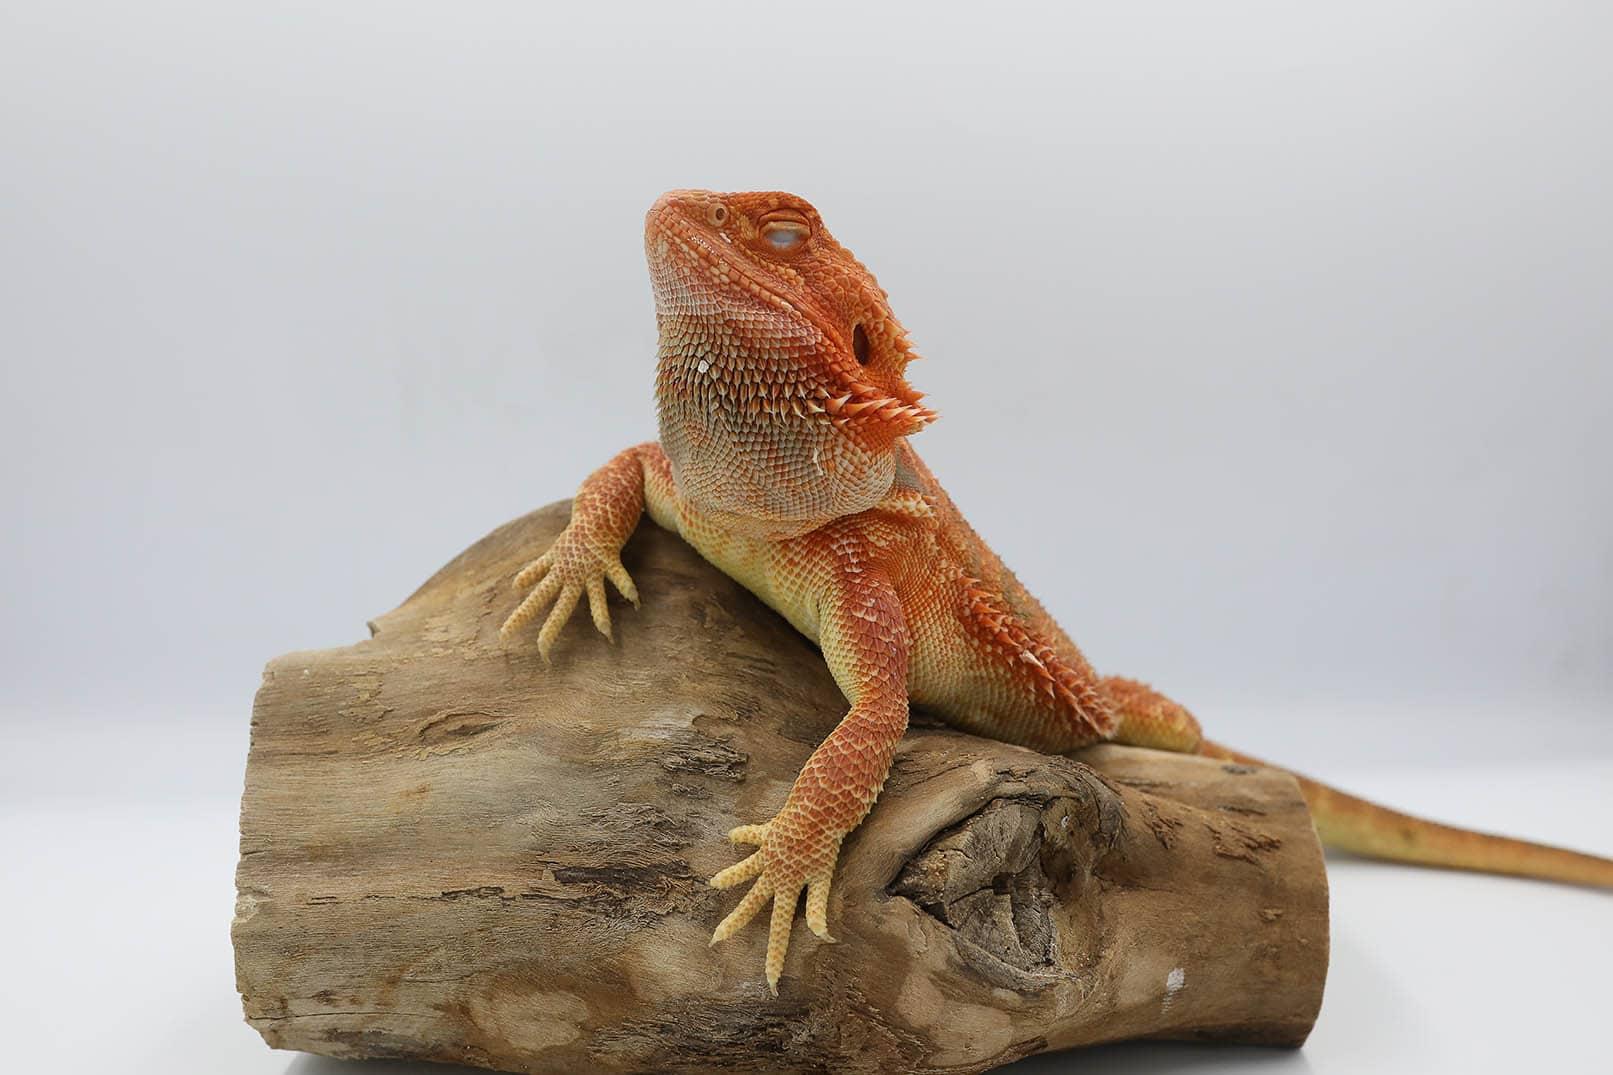 bearded dragon close eyes